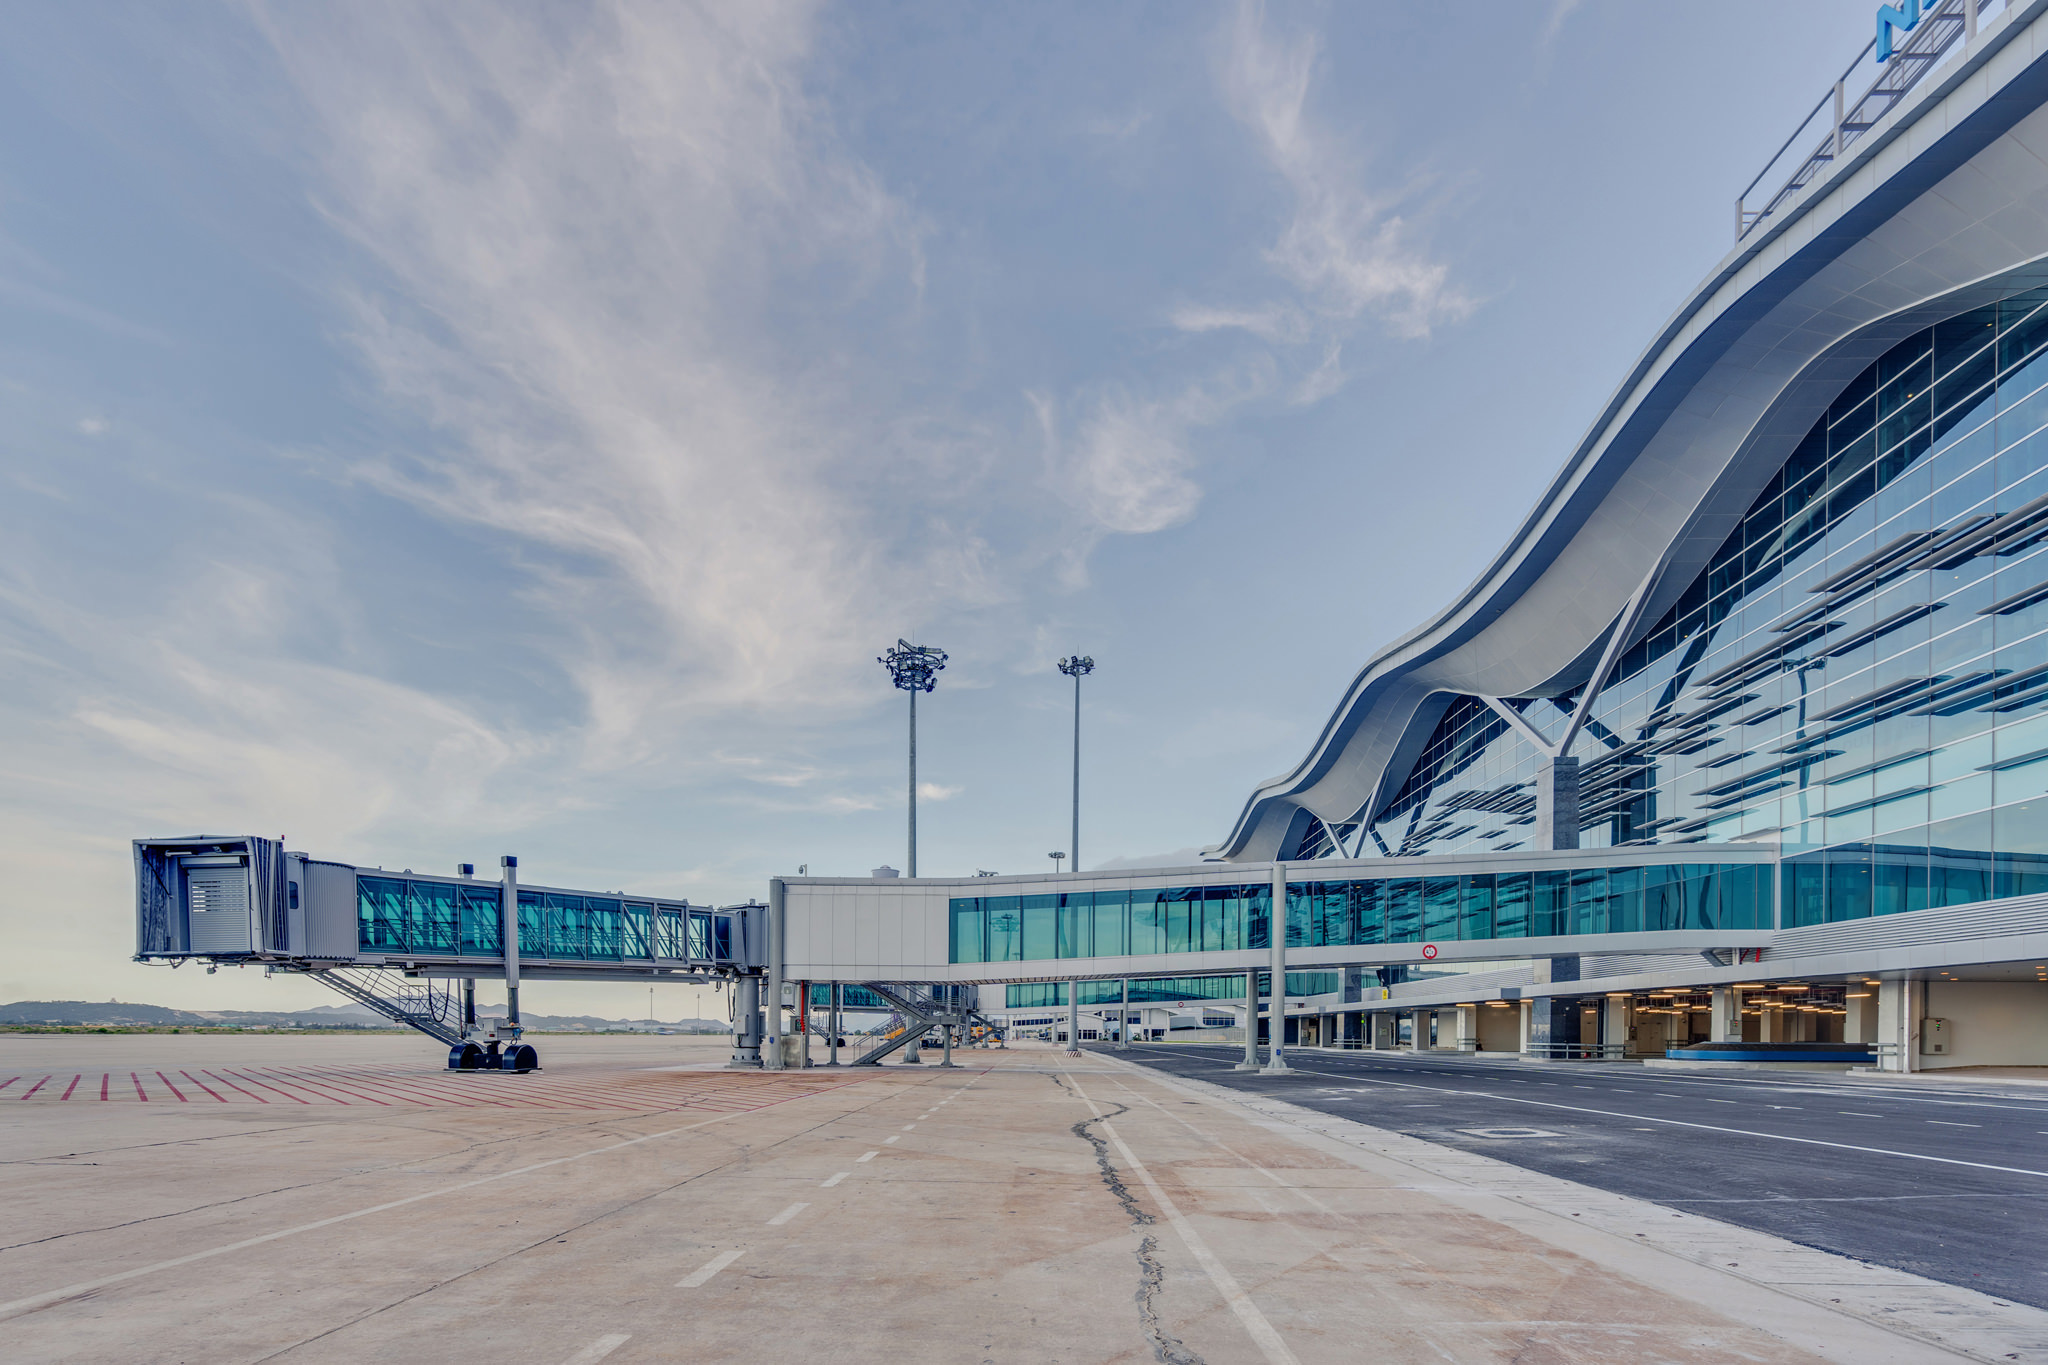 20180626 - Cam Ranh Airport - Architecture - 0368.jpg